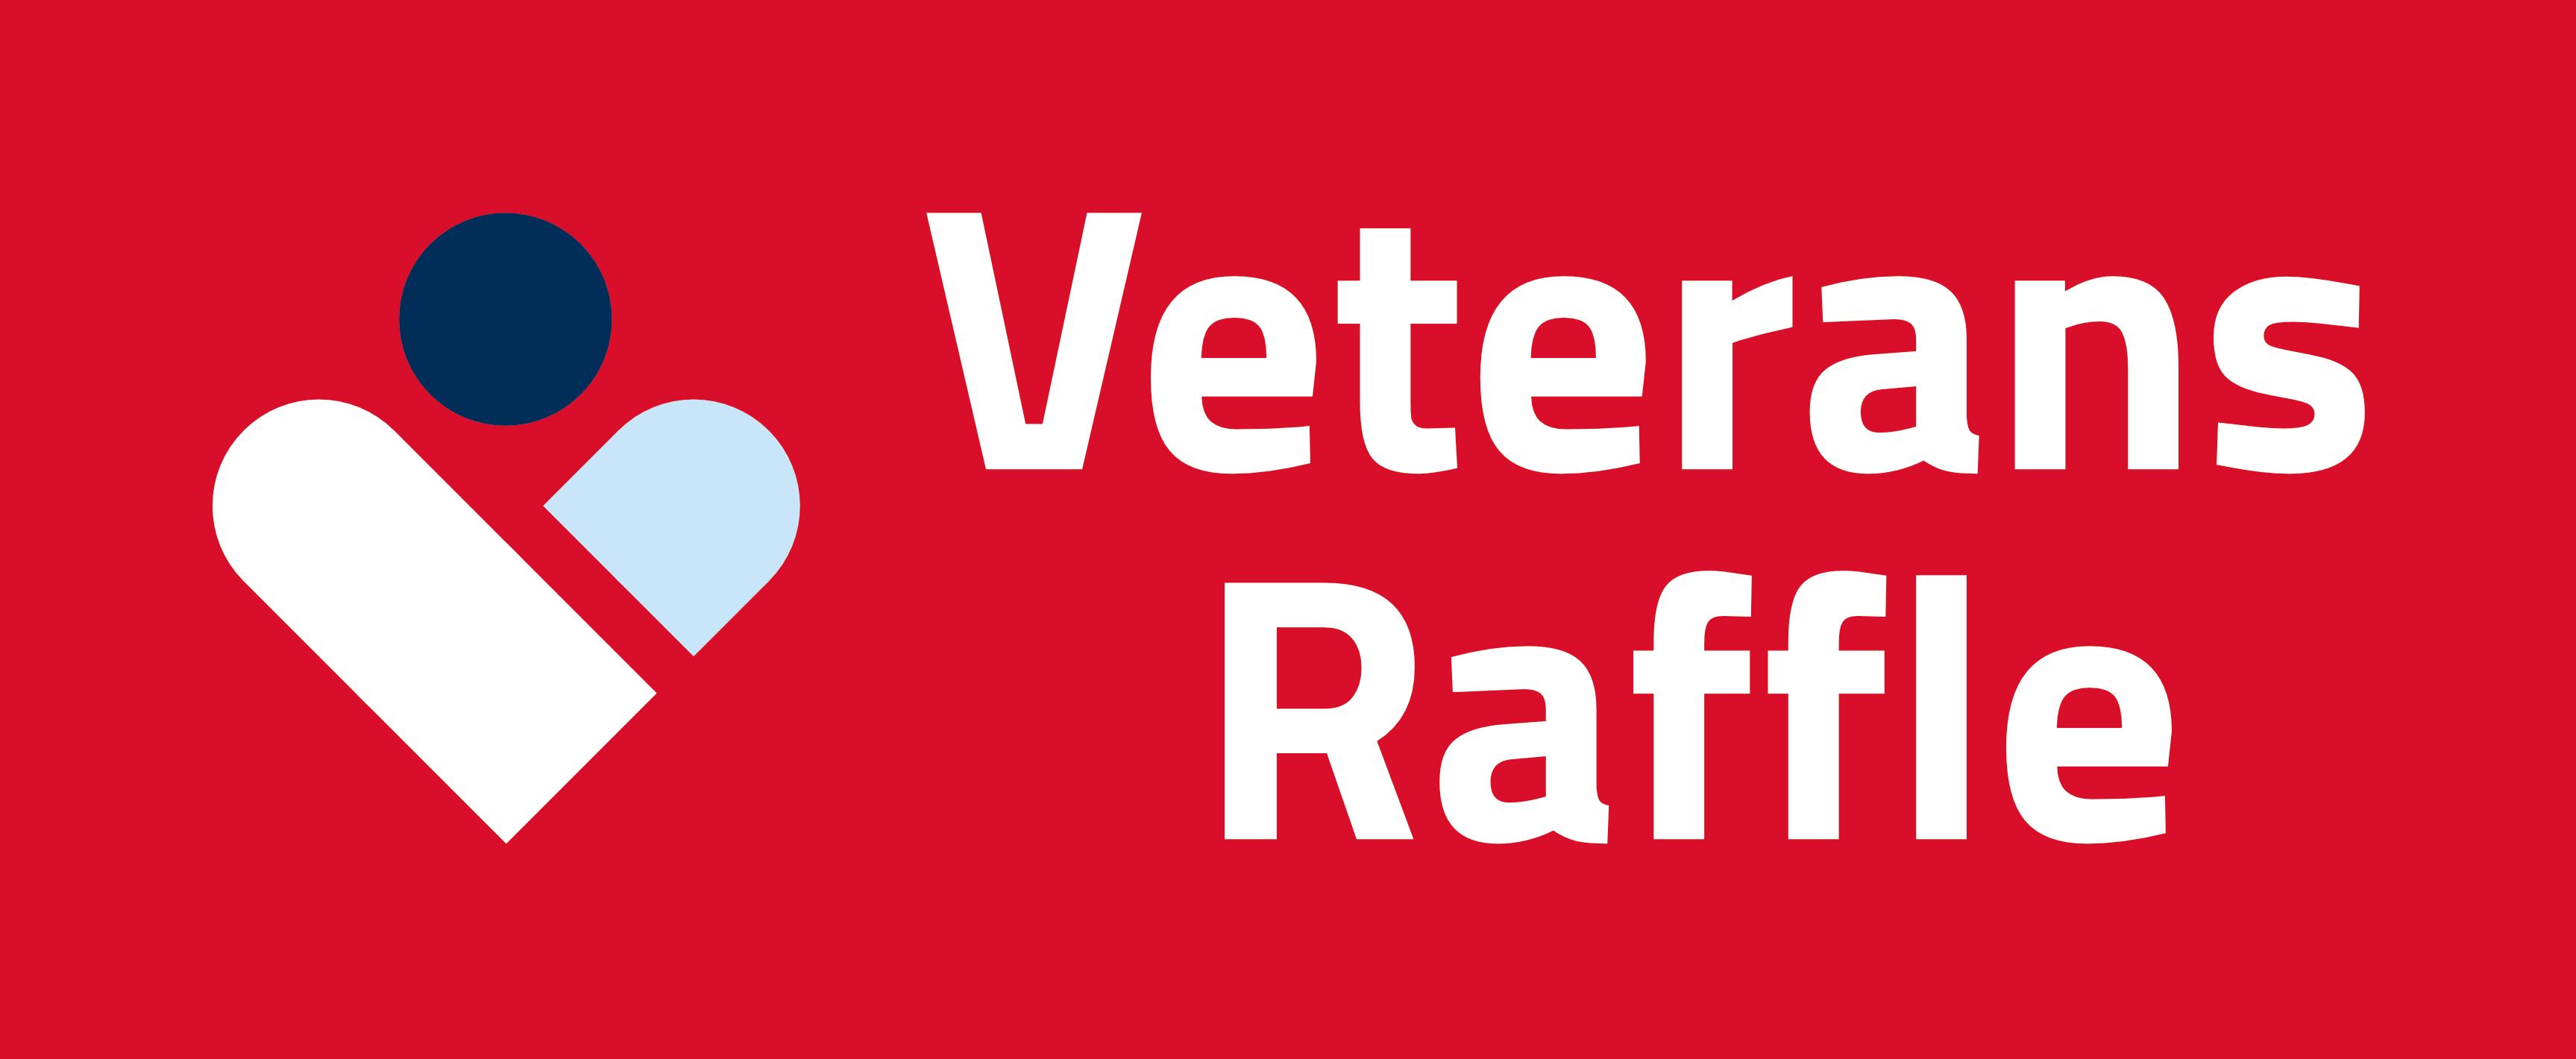 Veterans Raffle logo